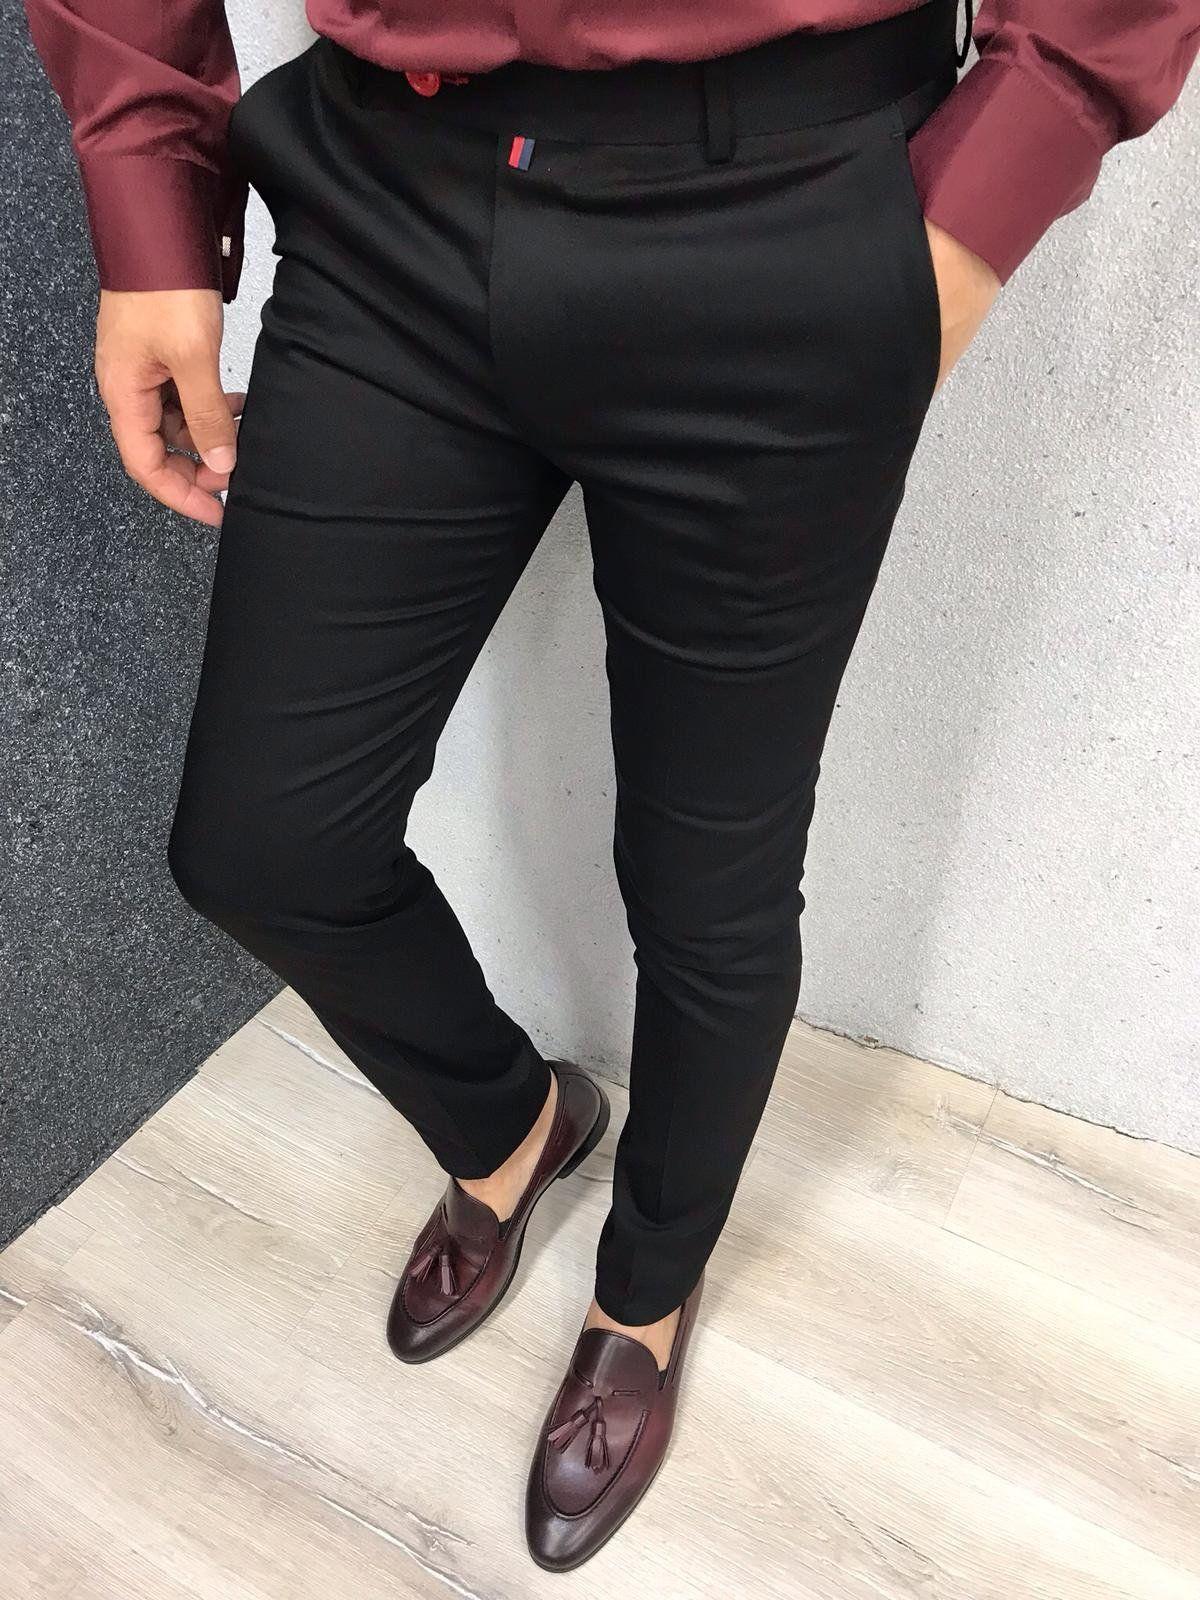 Kingston Black Slim Pants Black Slim Fit Dress Pants Slim Fit Dress Pants Black Slim Pants [ 1600 x 1200 Pixel ]